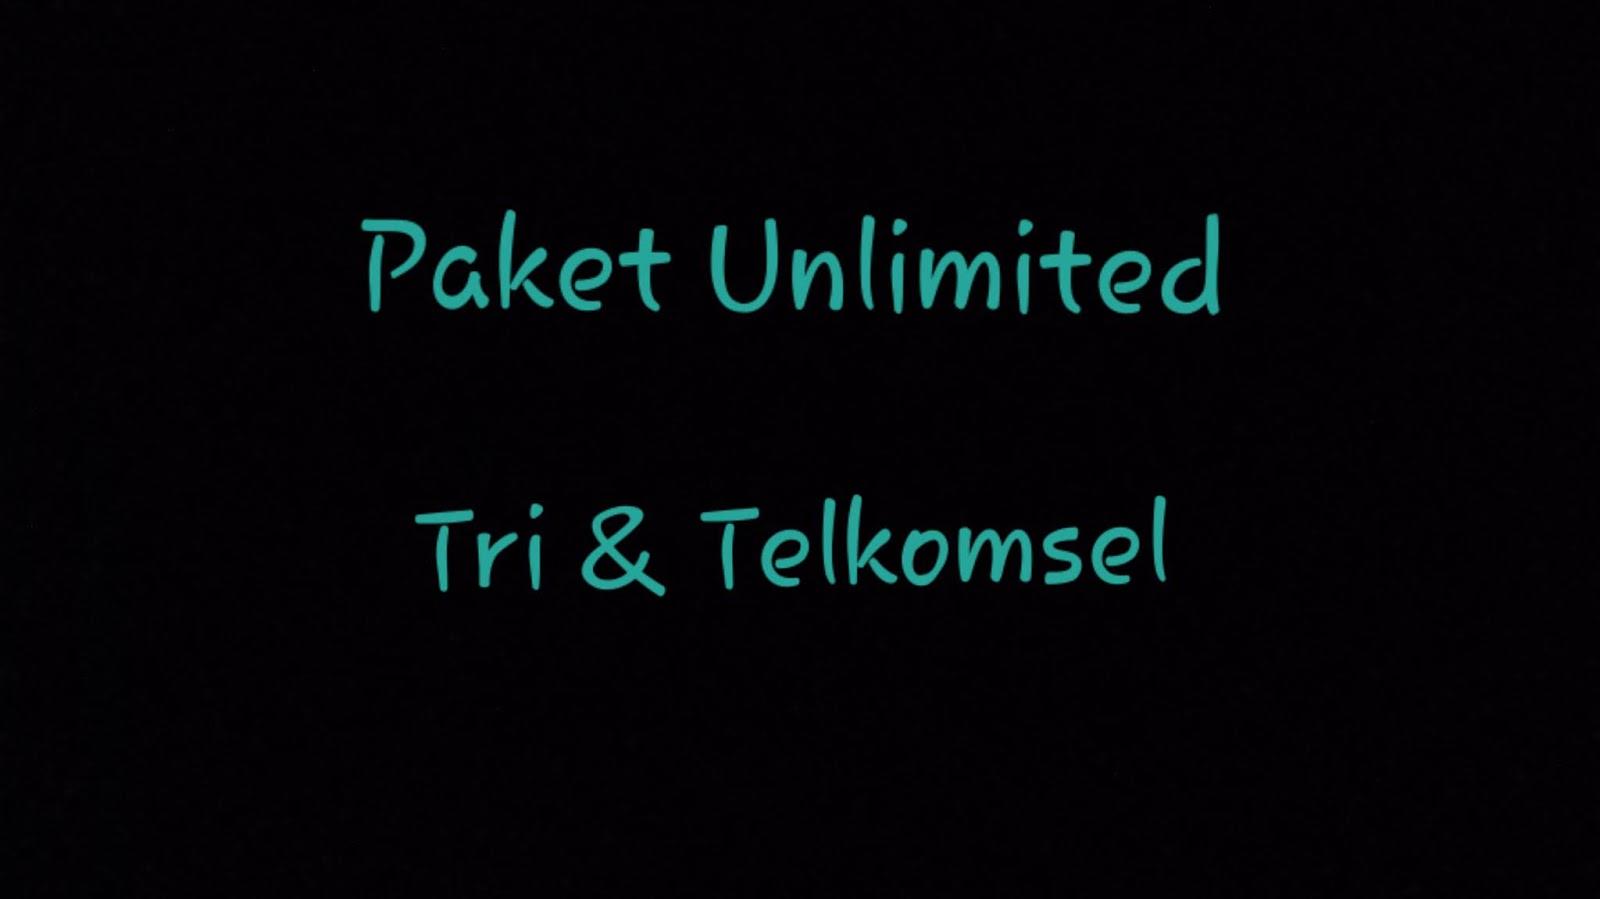 Beli Paket Internet Unlimited Sosial Media Tri atau Telkomsel?